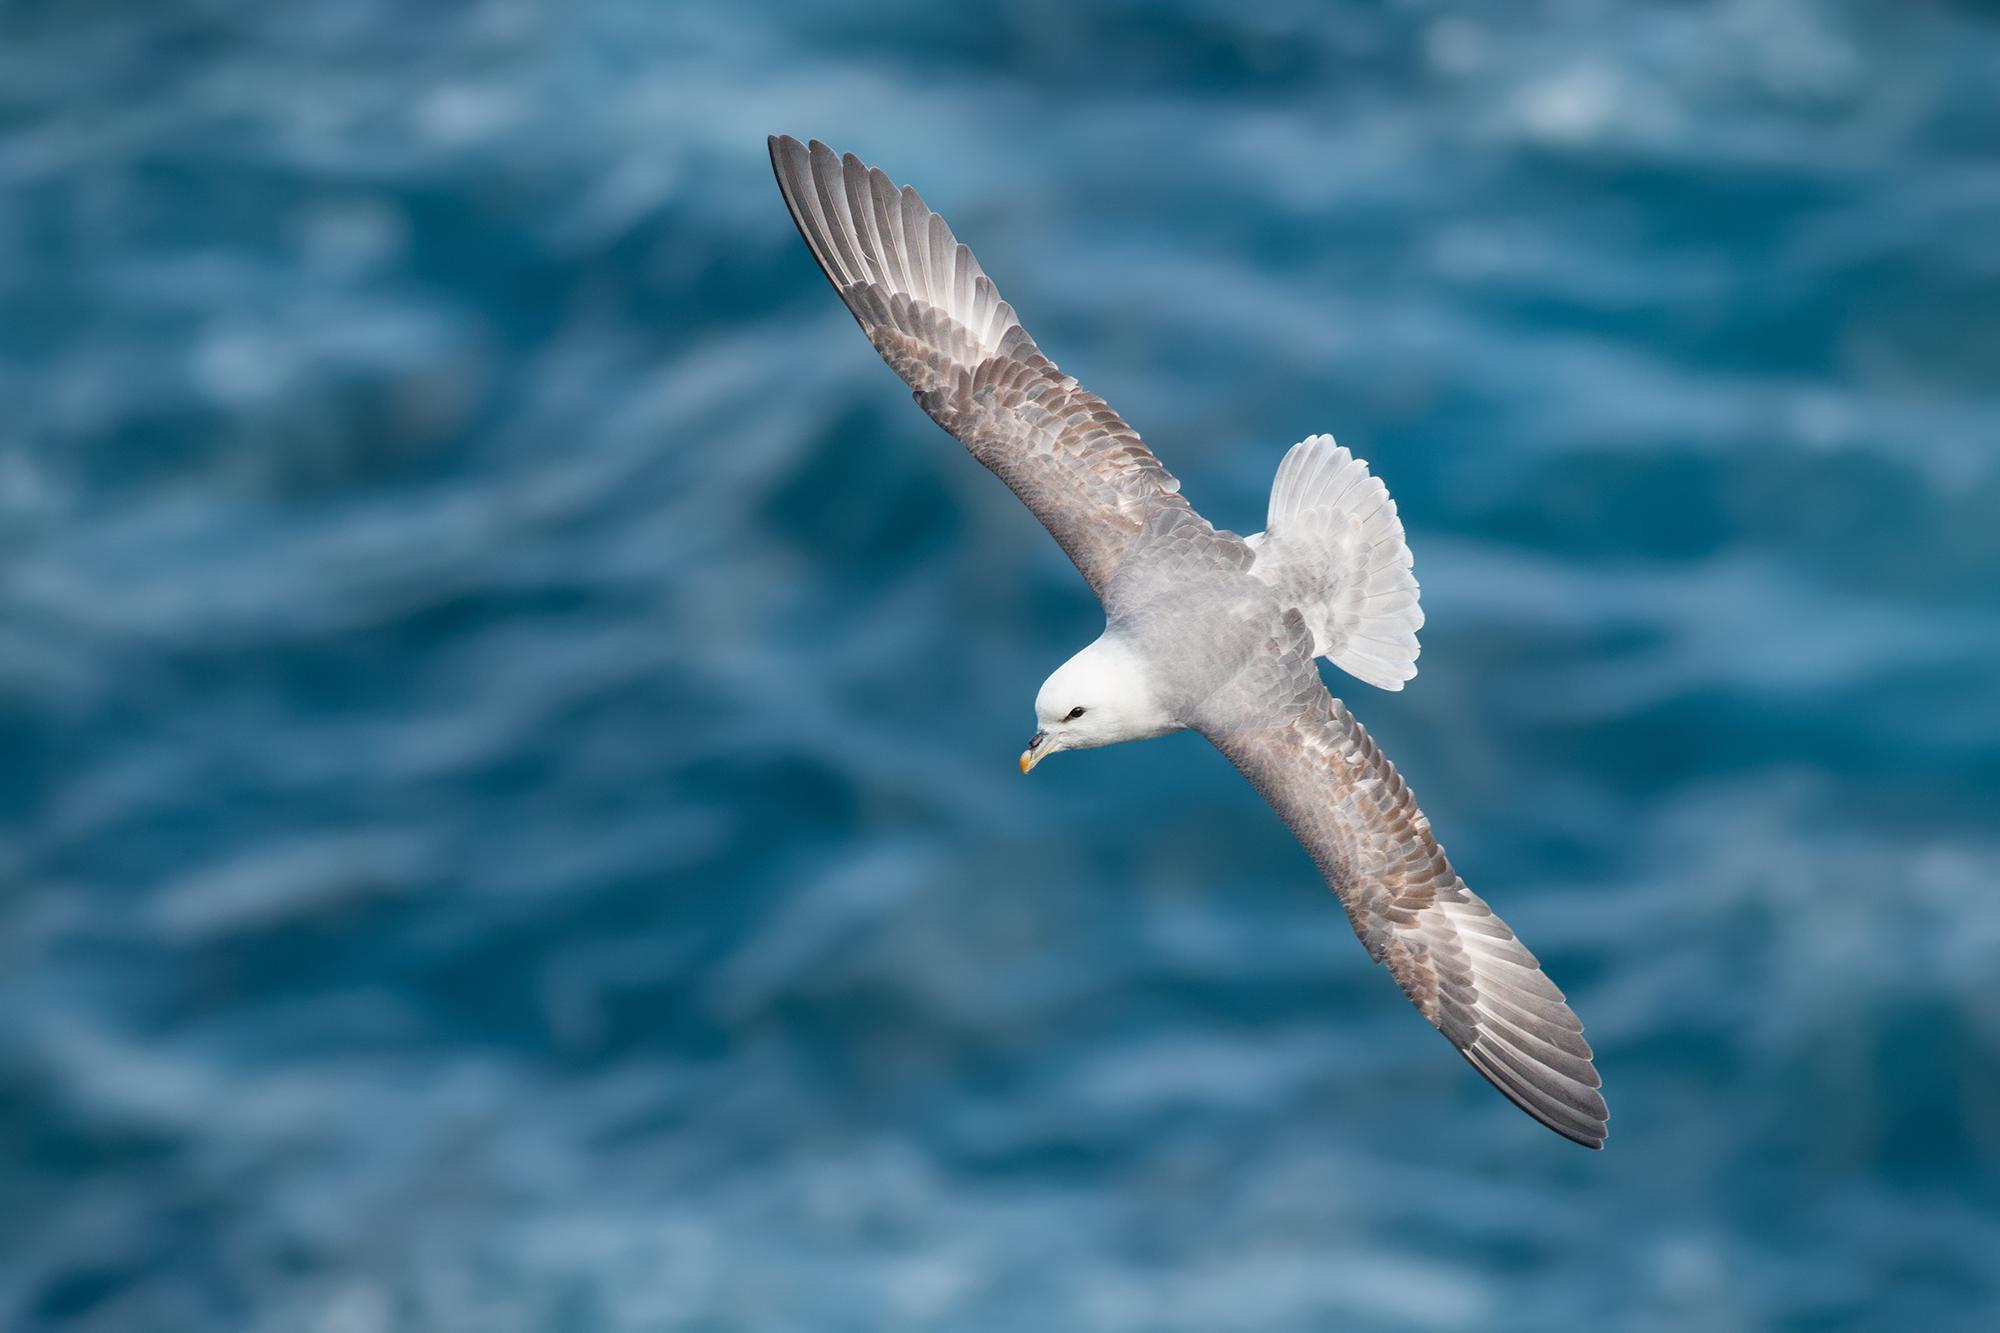 Stormfågel-JPEG_web 6.jpg